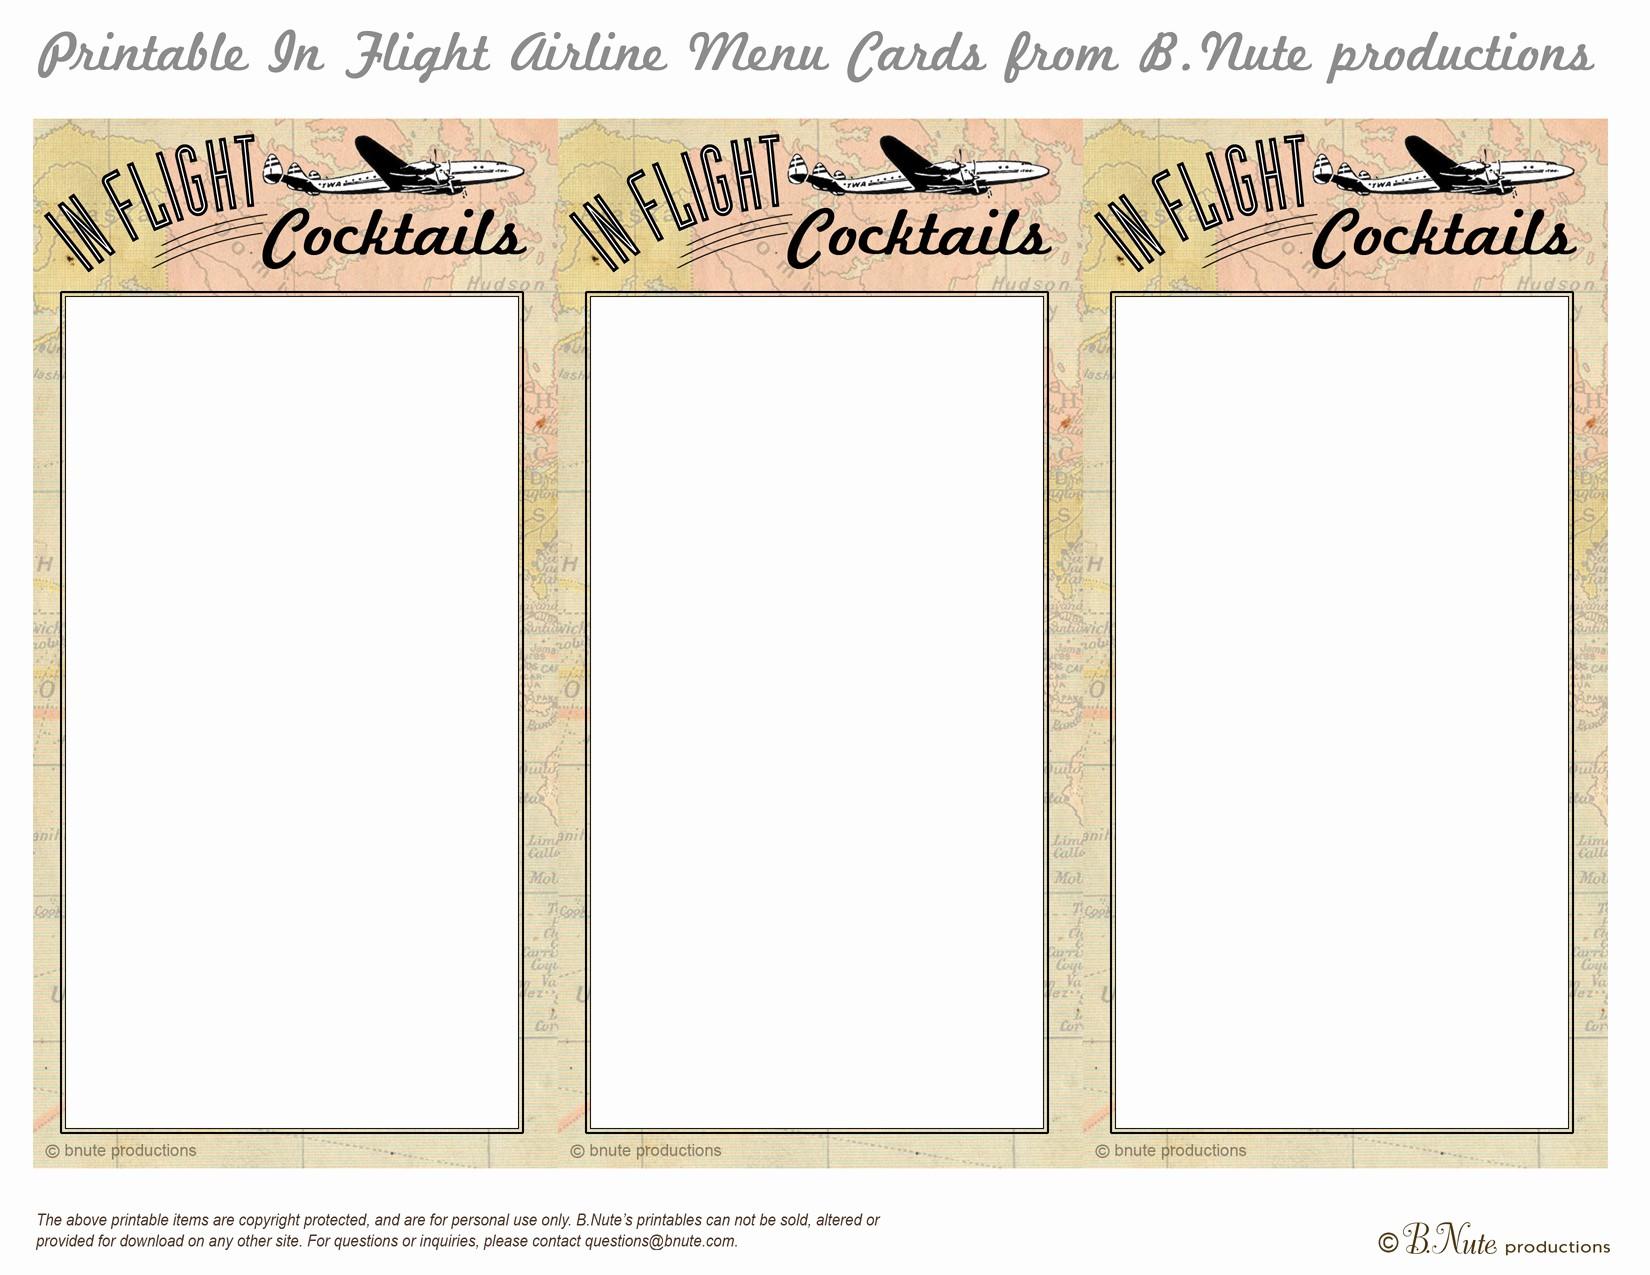 Free Printable Drink Menu Template Beautiful Bnute Productions Free Printable In Flight Menu Cards